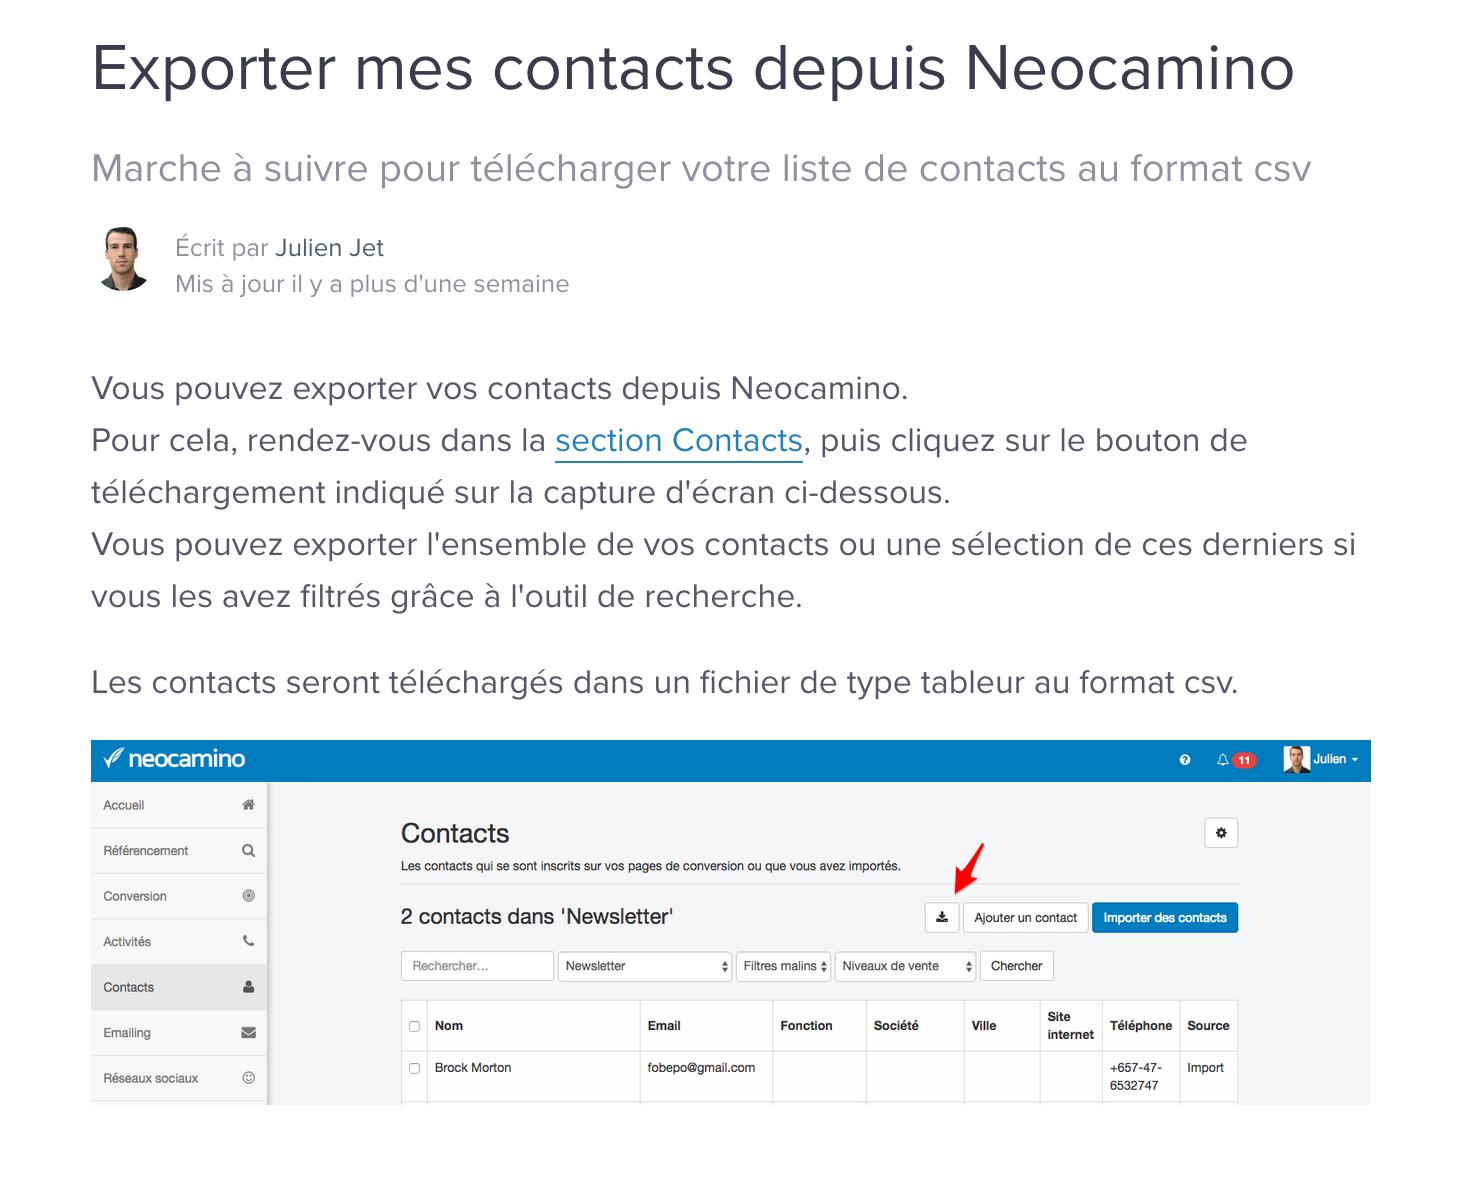 Neocamino-lead-nurturing-onboarding